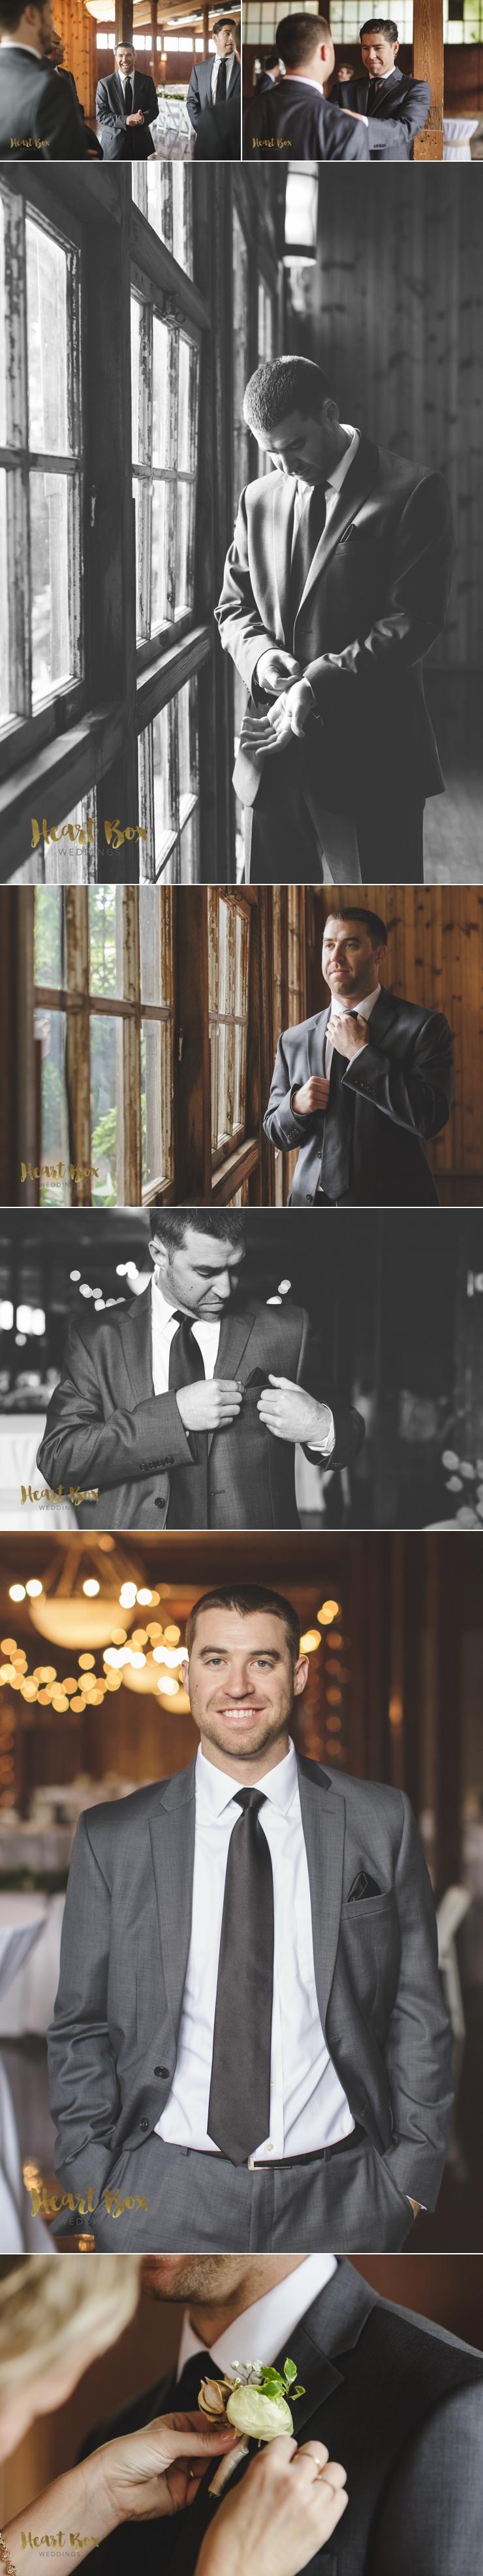 Popplewell Wedding Blog Collages 8.jpg